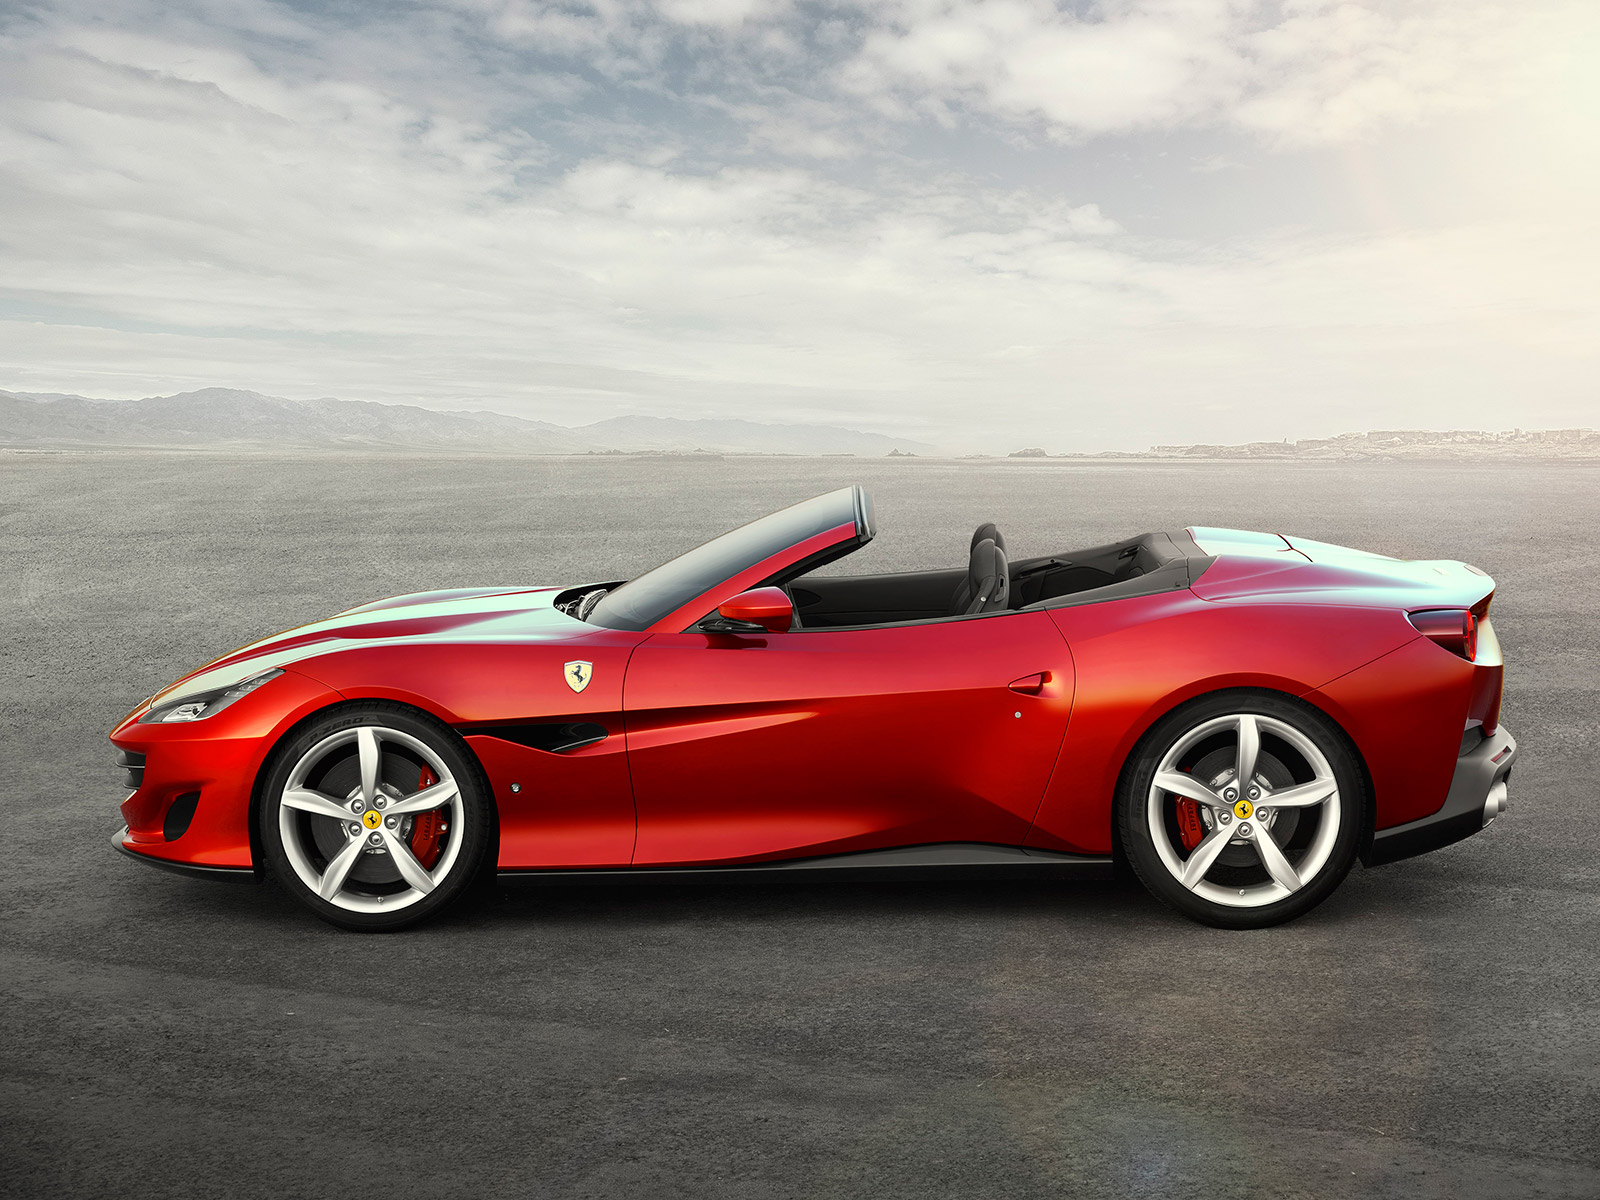 Ferrari Portofino Is The California T S Unexpected 592 Hp